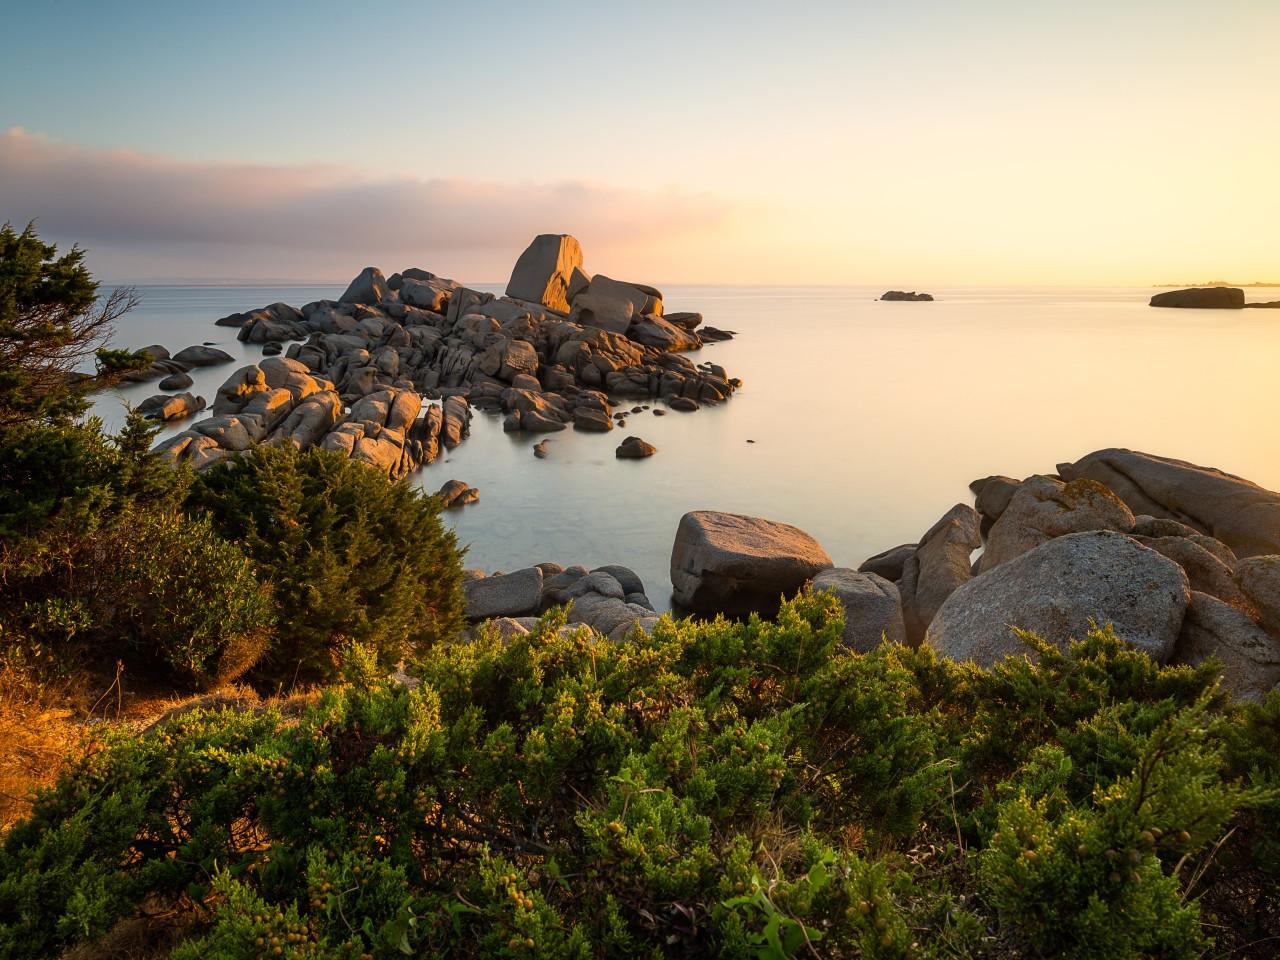 La perla del Mediterraneo | Viaggia con Expert Travel Team